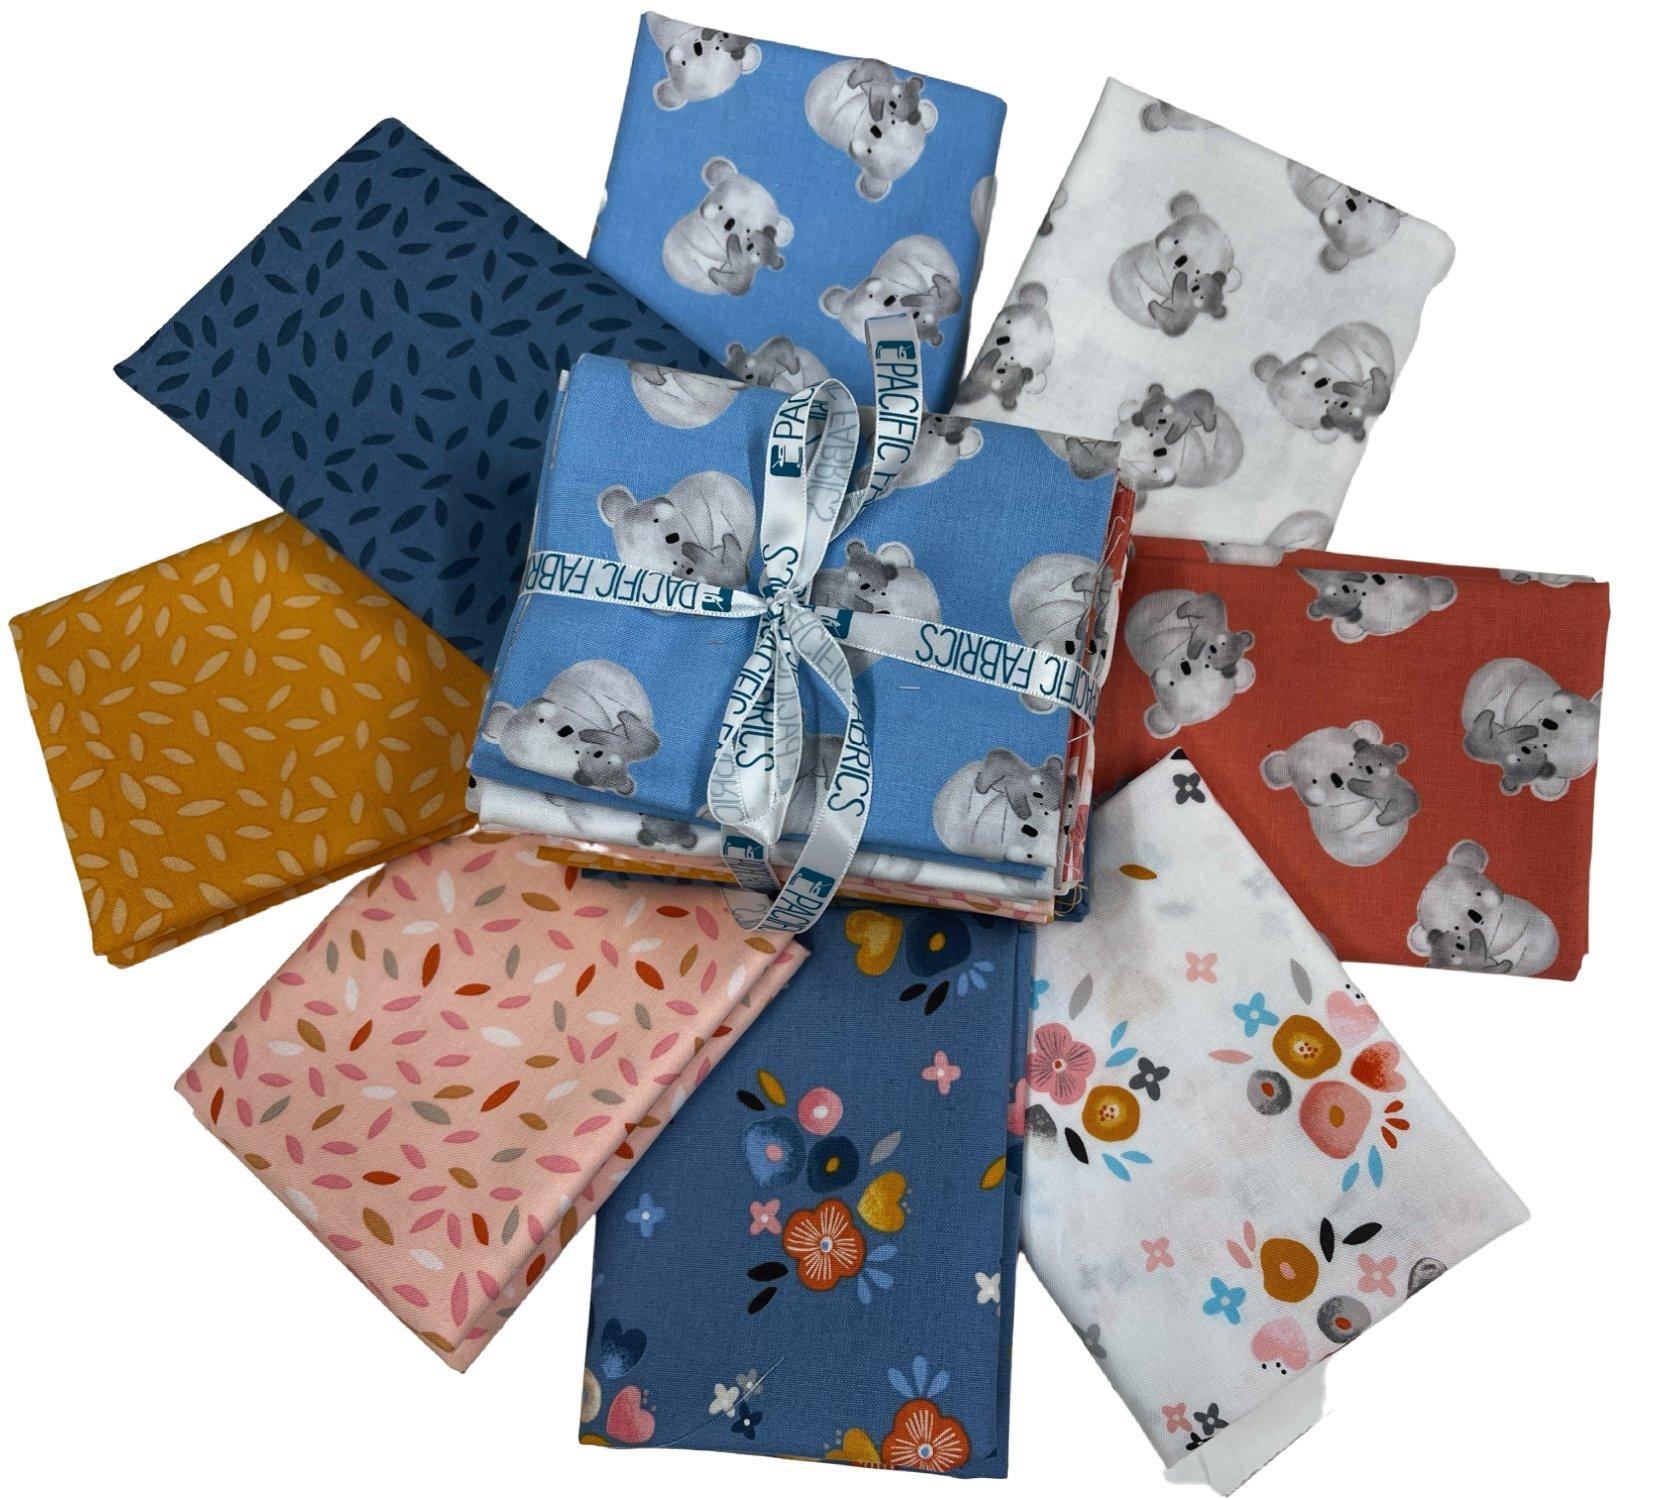 Windham Fabrics, Kenzie, Fat Quarter Bundle - 8 pc